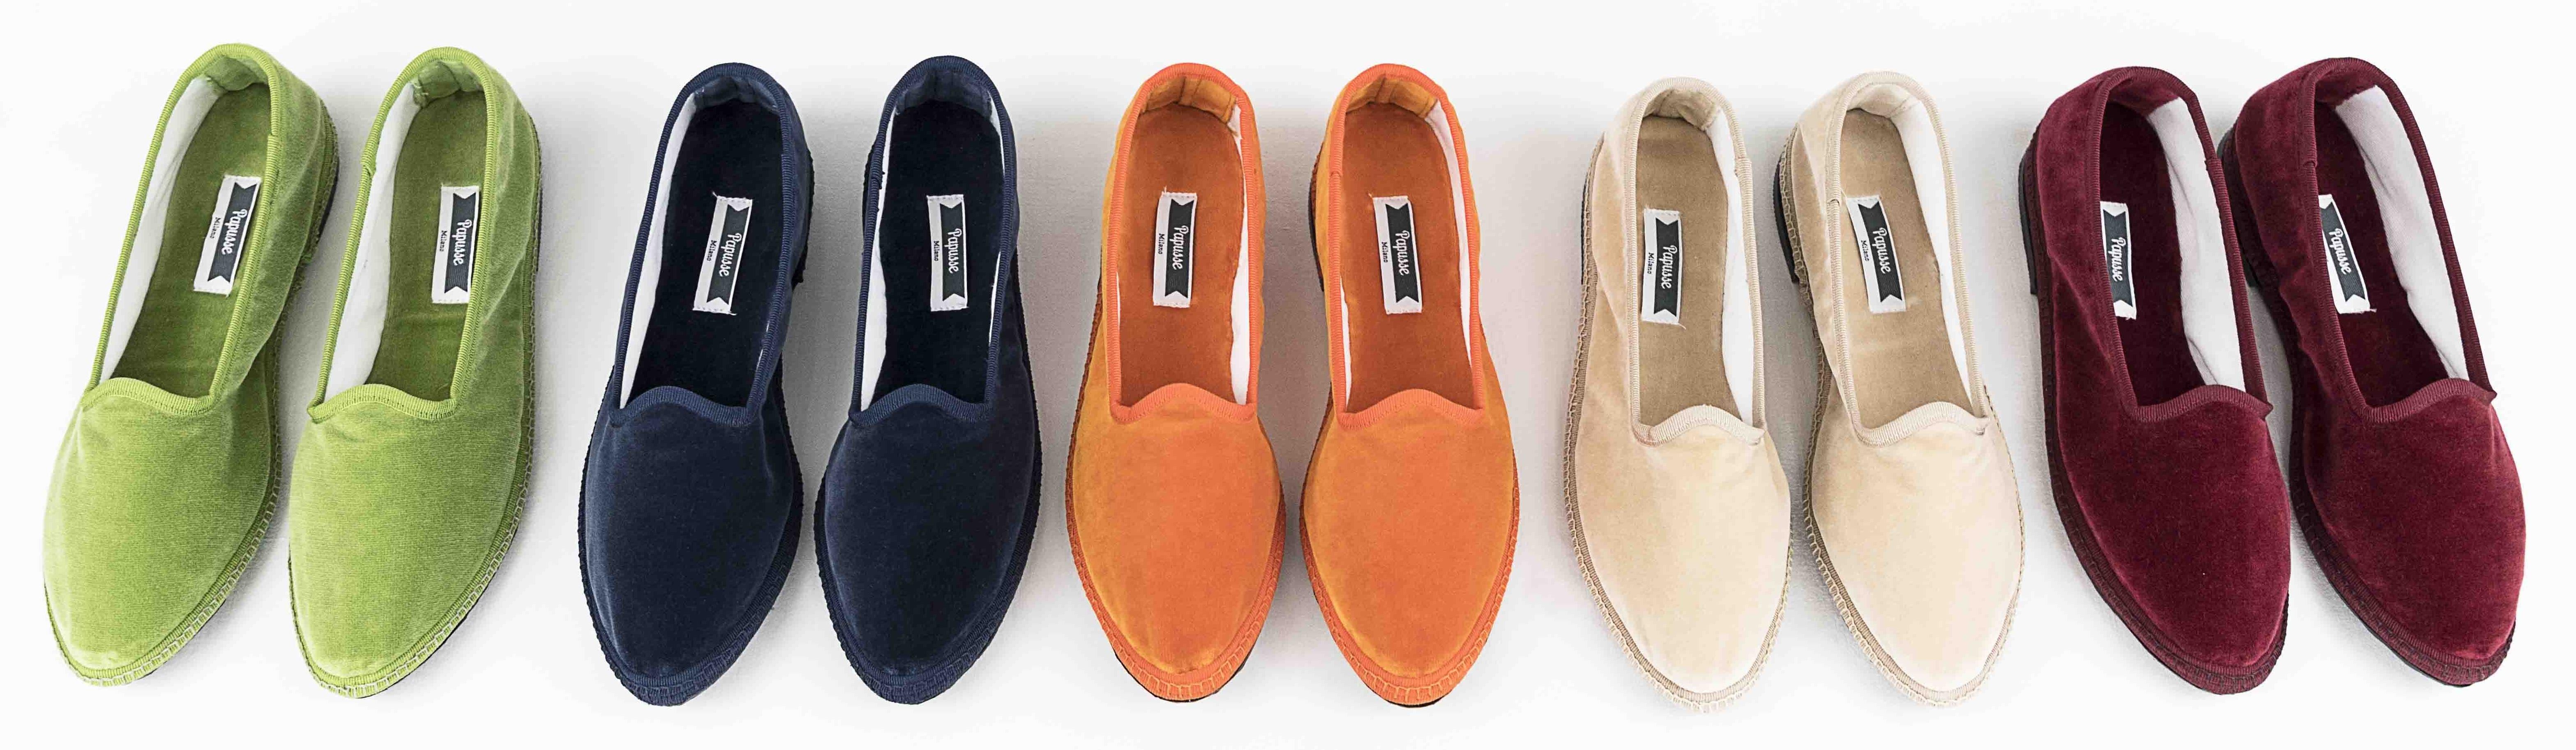 scarpe friulane